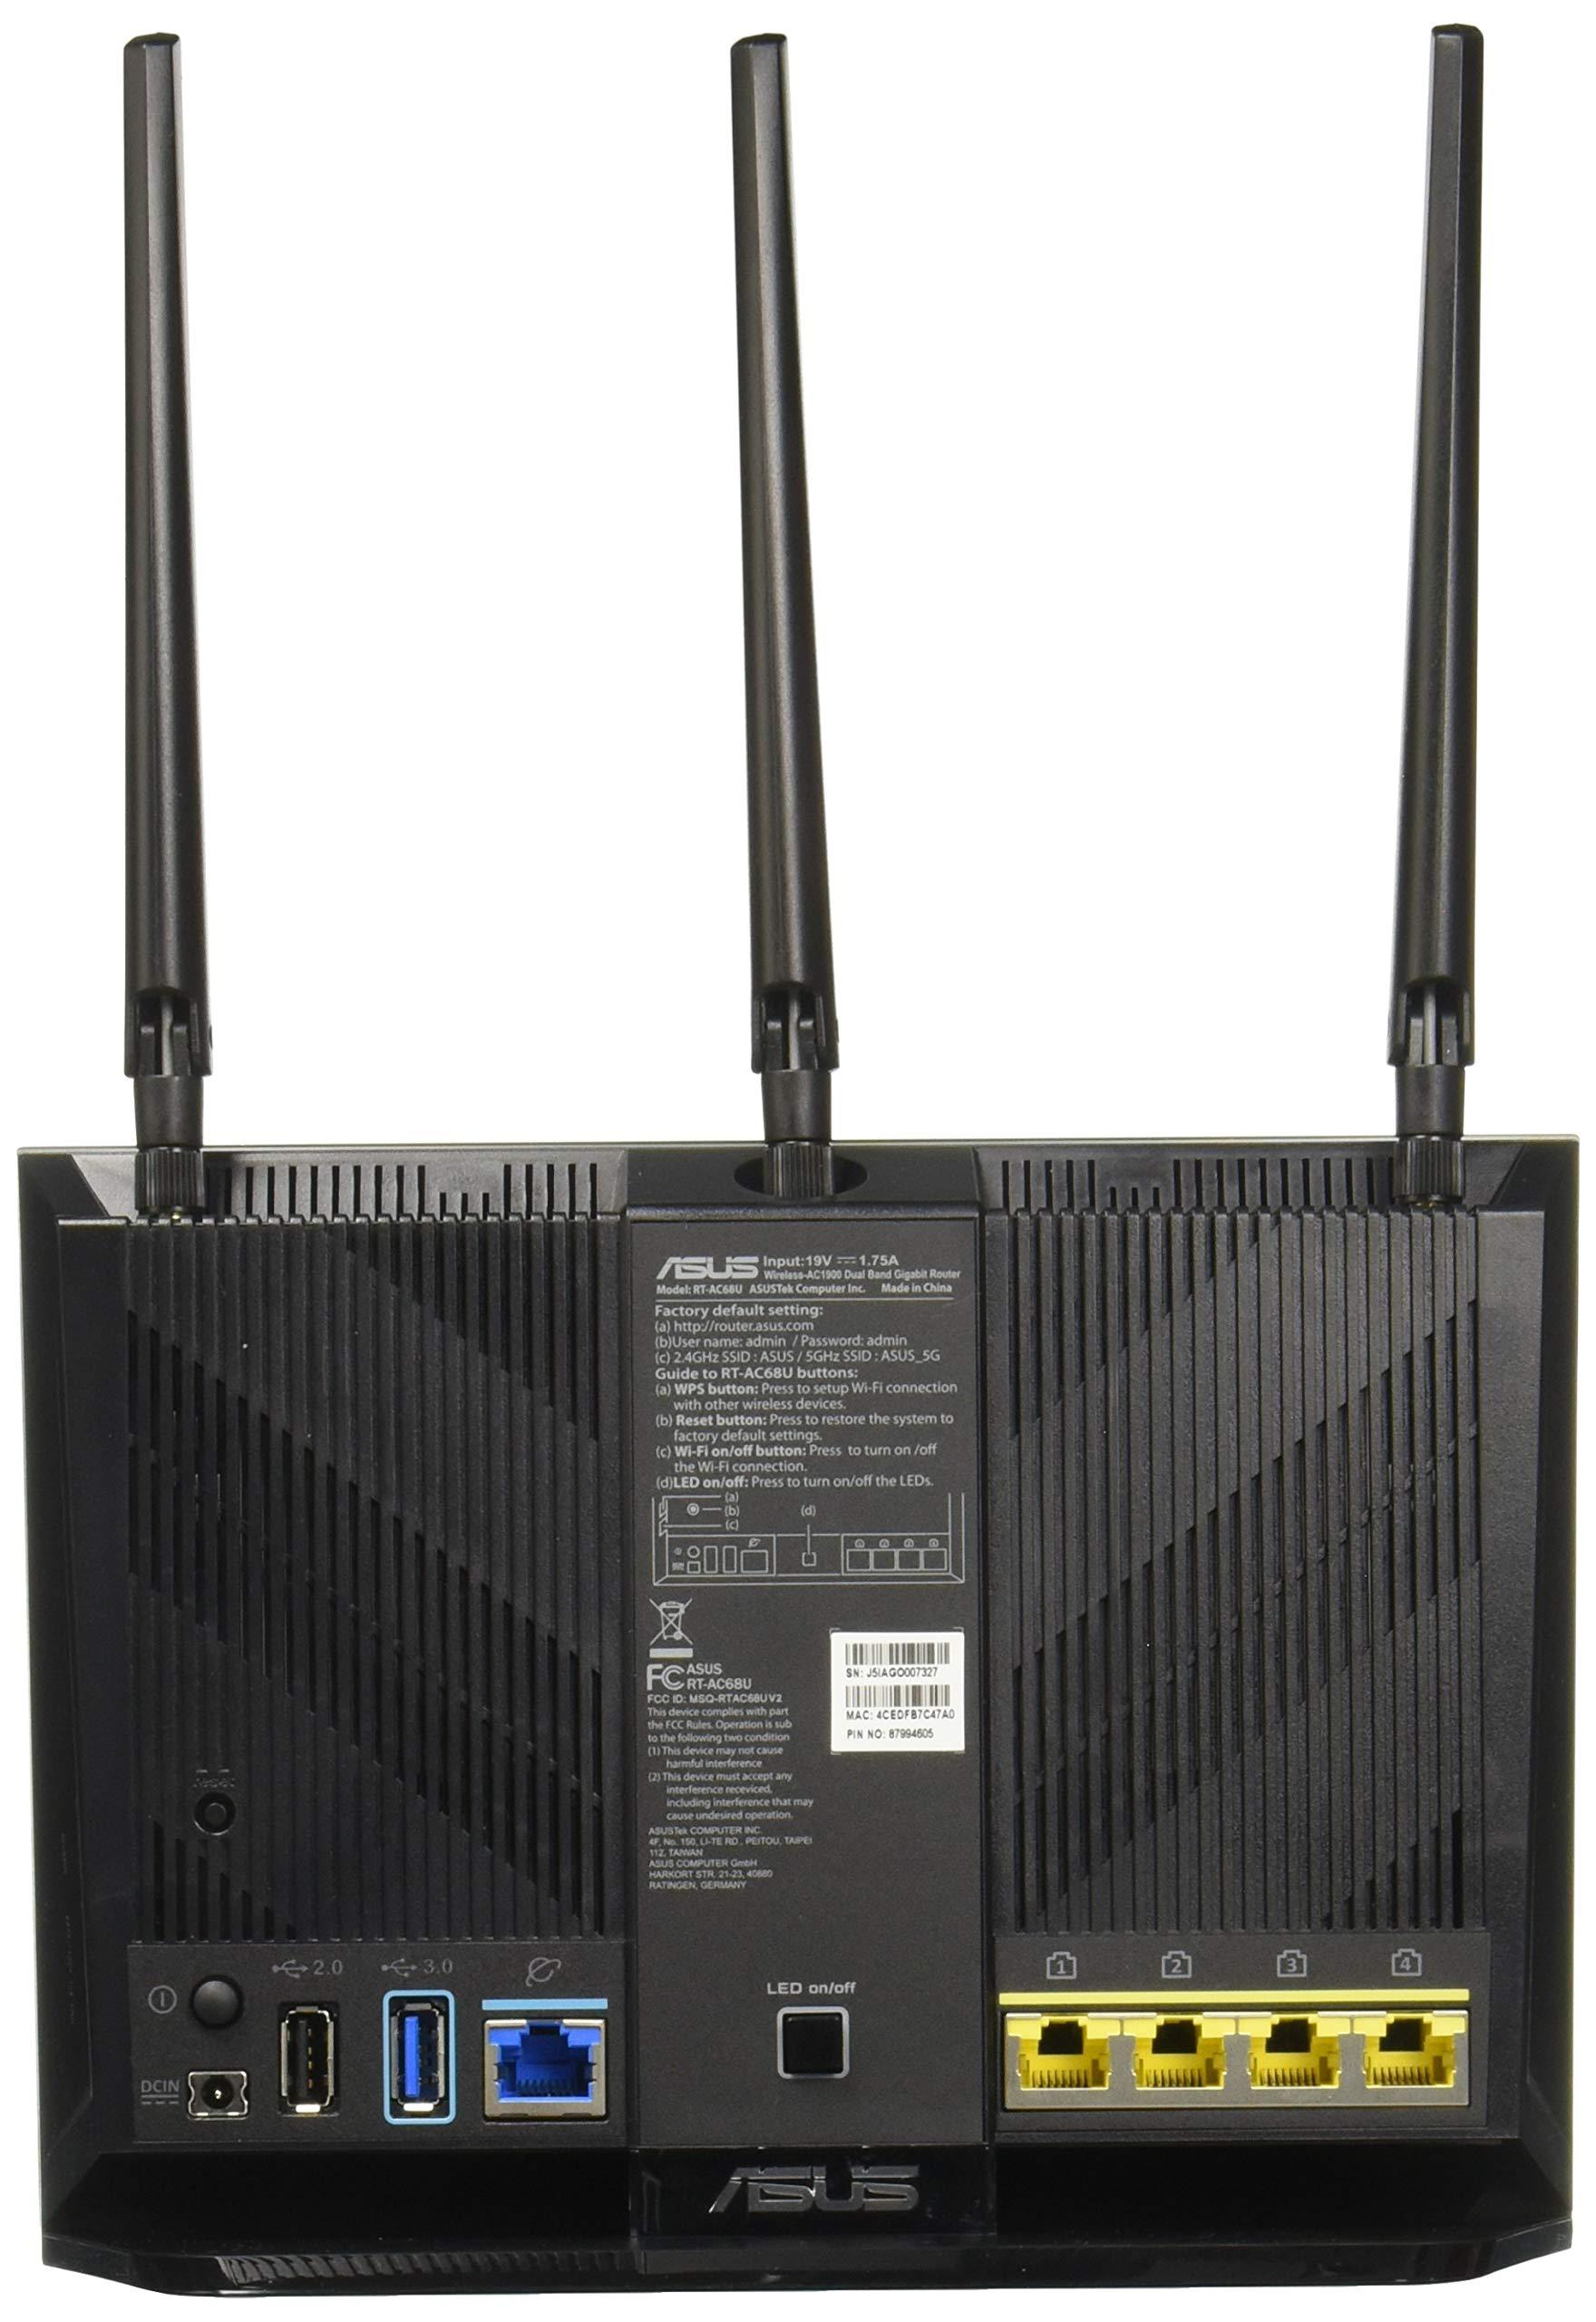 ASUS RT-AC68U AiMesh (2 pack) AC1900 Whole Home Dual-band AiMesh